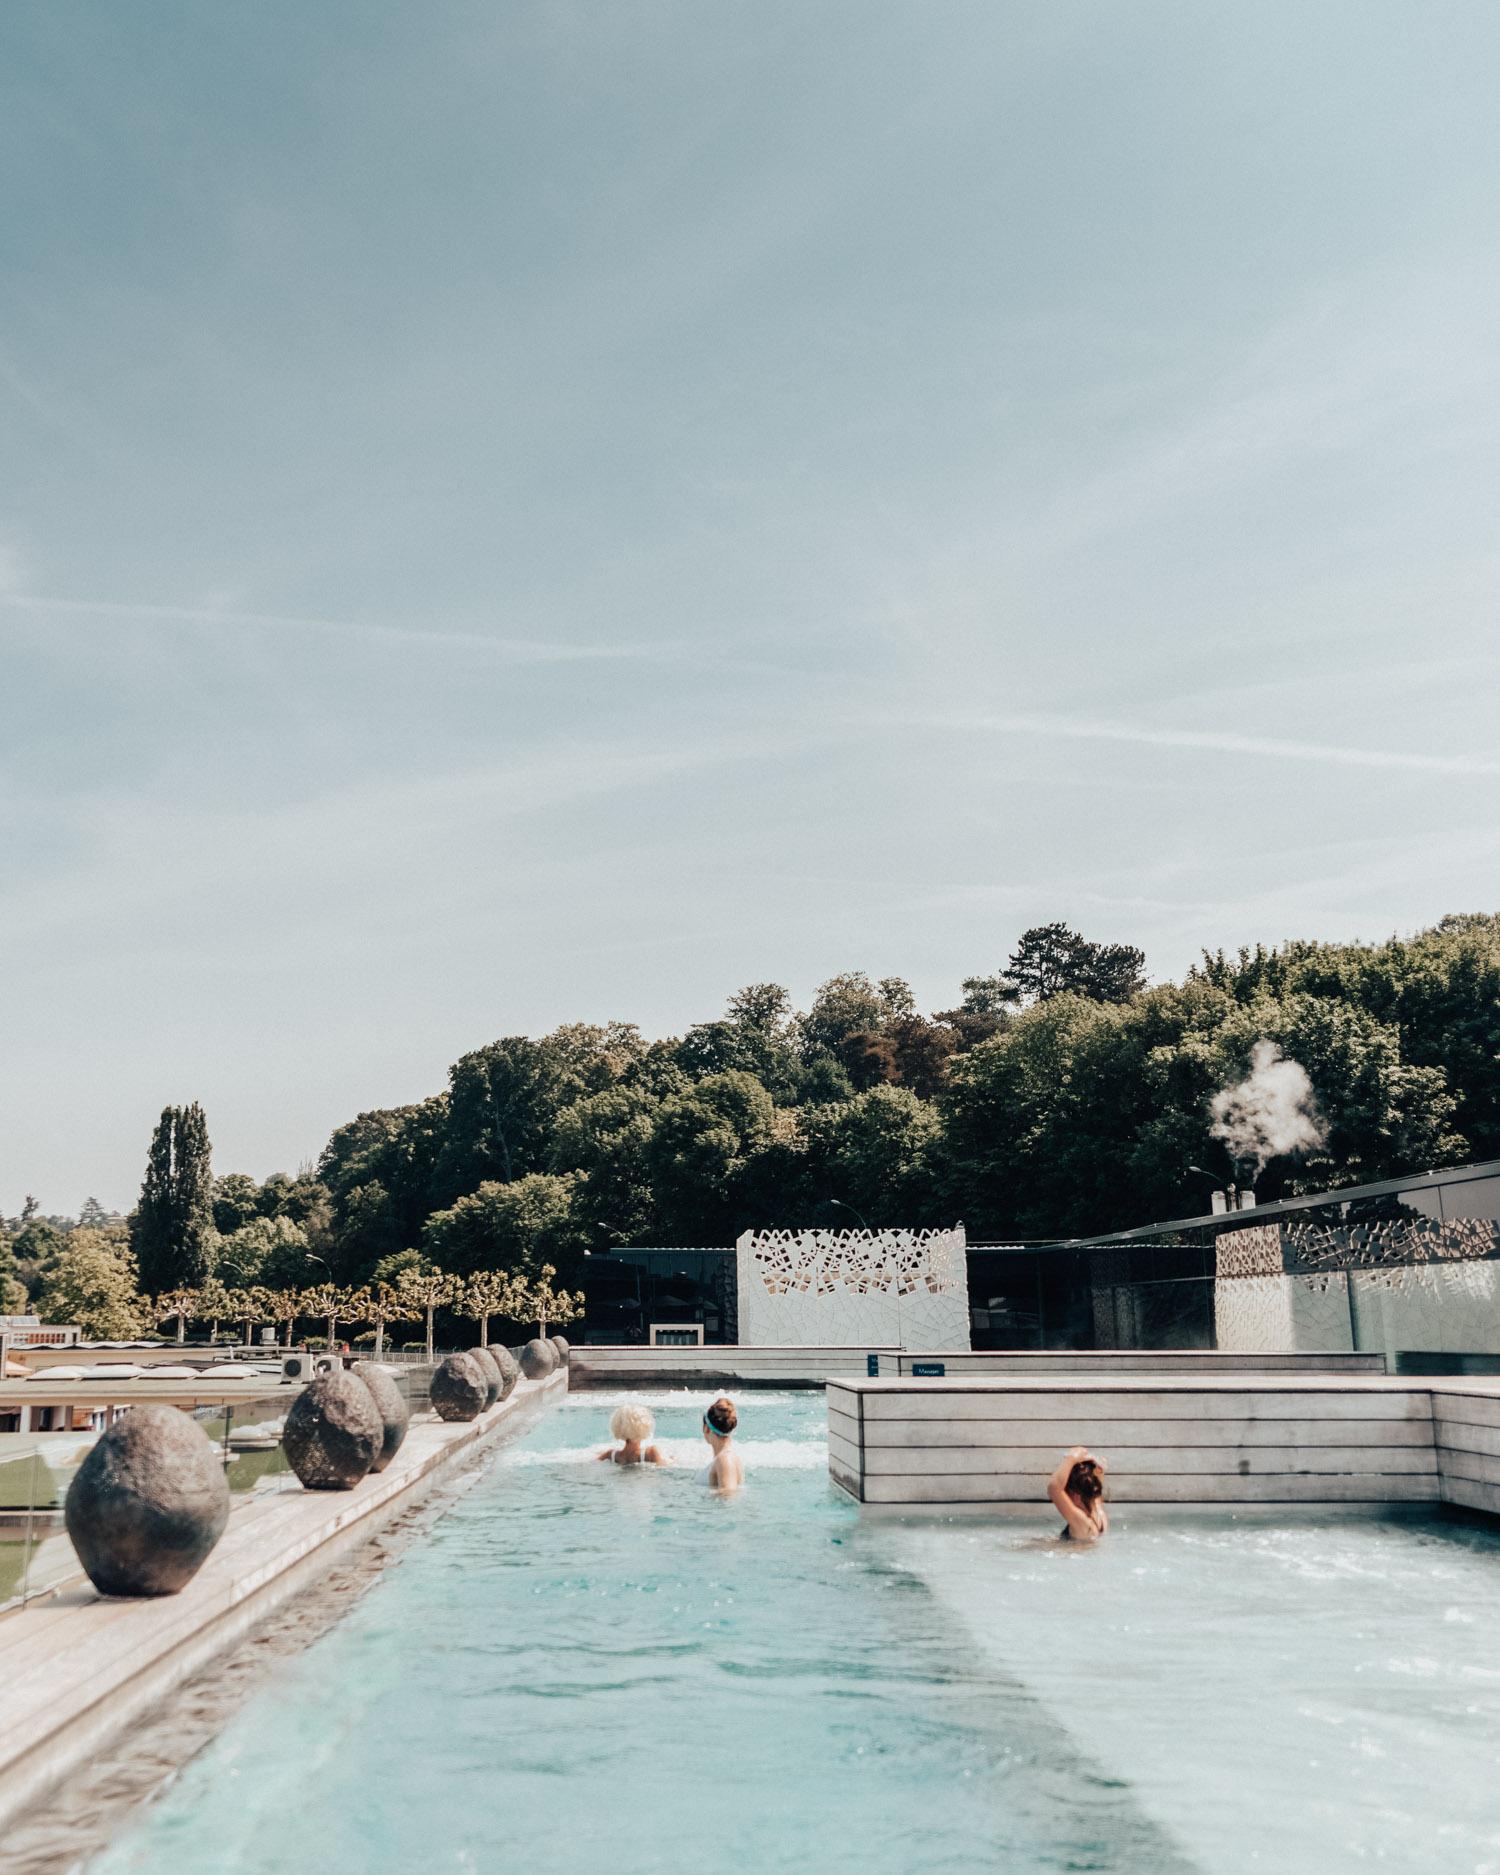 Bain-Bleu Hammam & Spa Genève-Plage - Outdoor pool